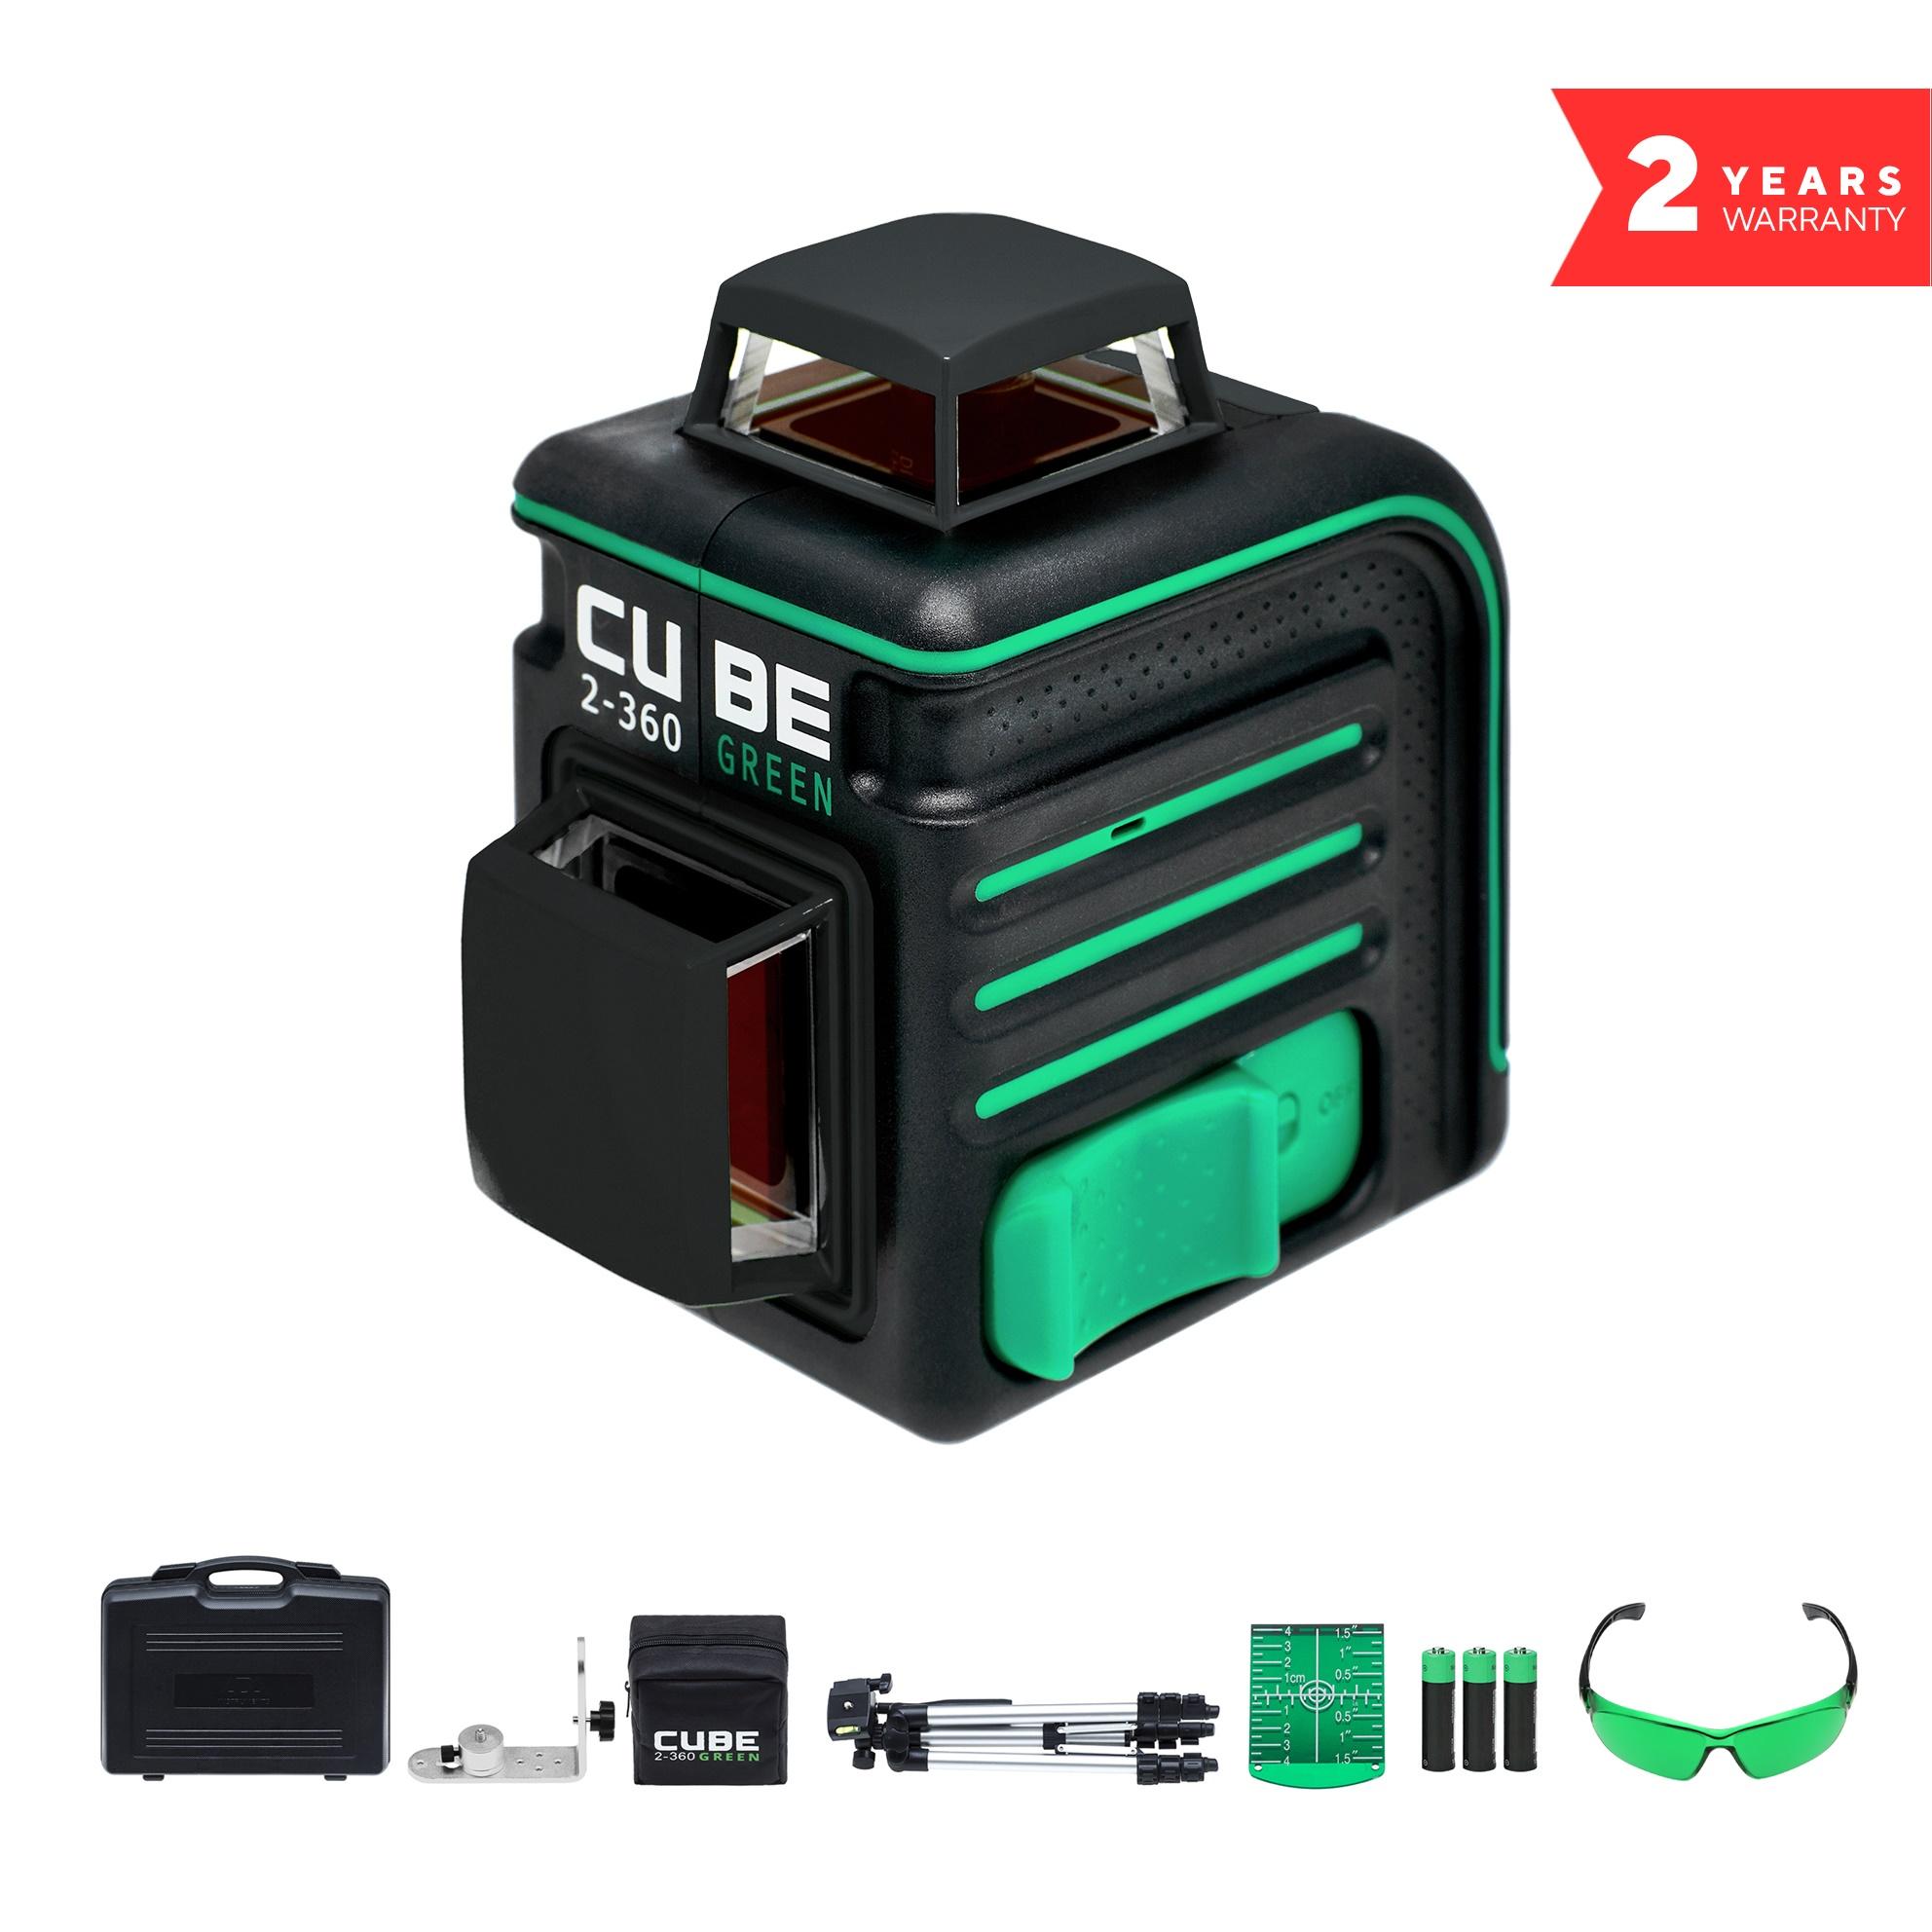 Laser Level ADA CUBE 2-360 Green